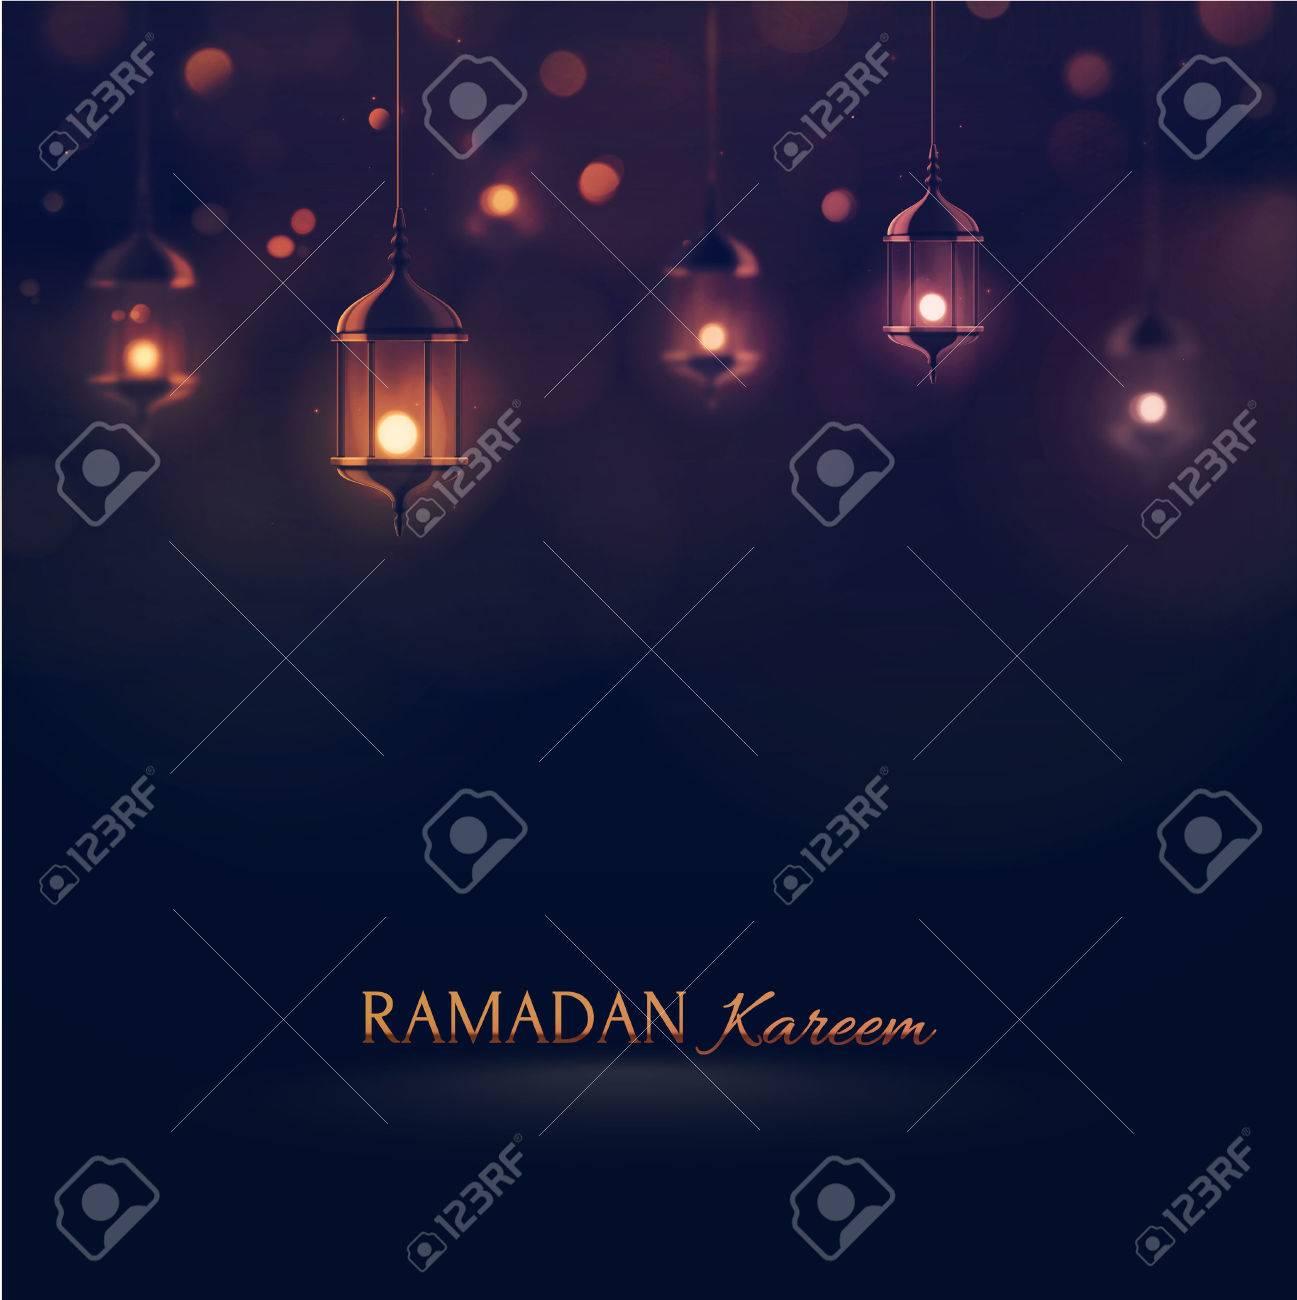 Ramadan Kareem, greeting background Standard-Bild - 40881012